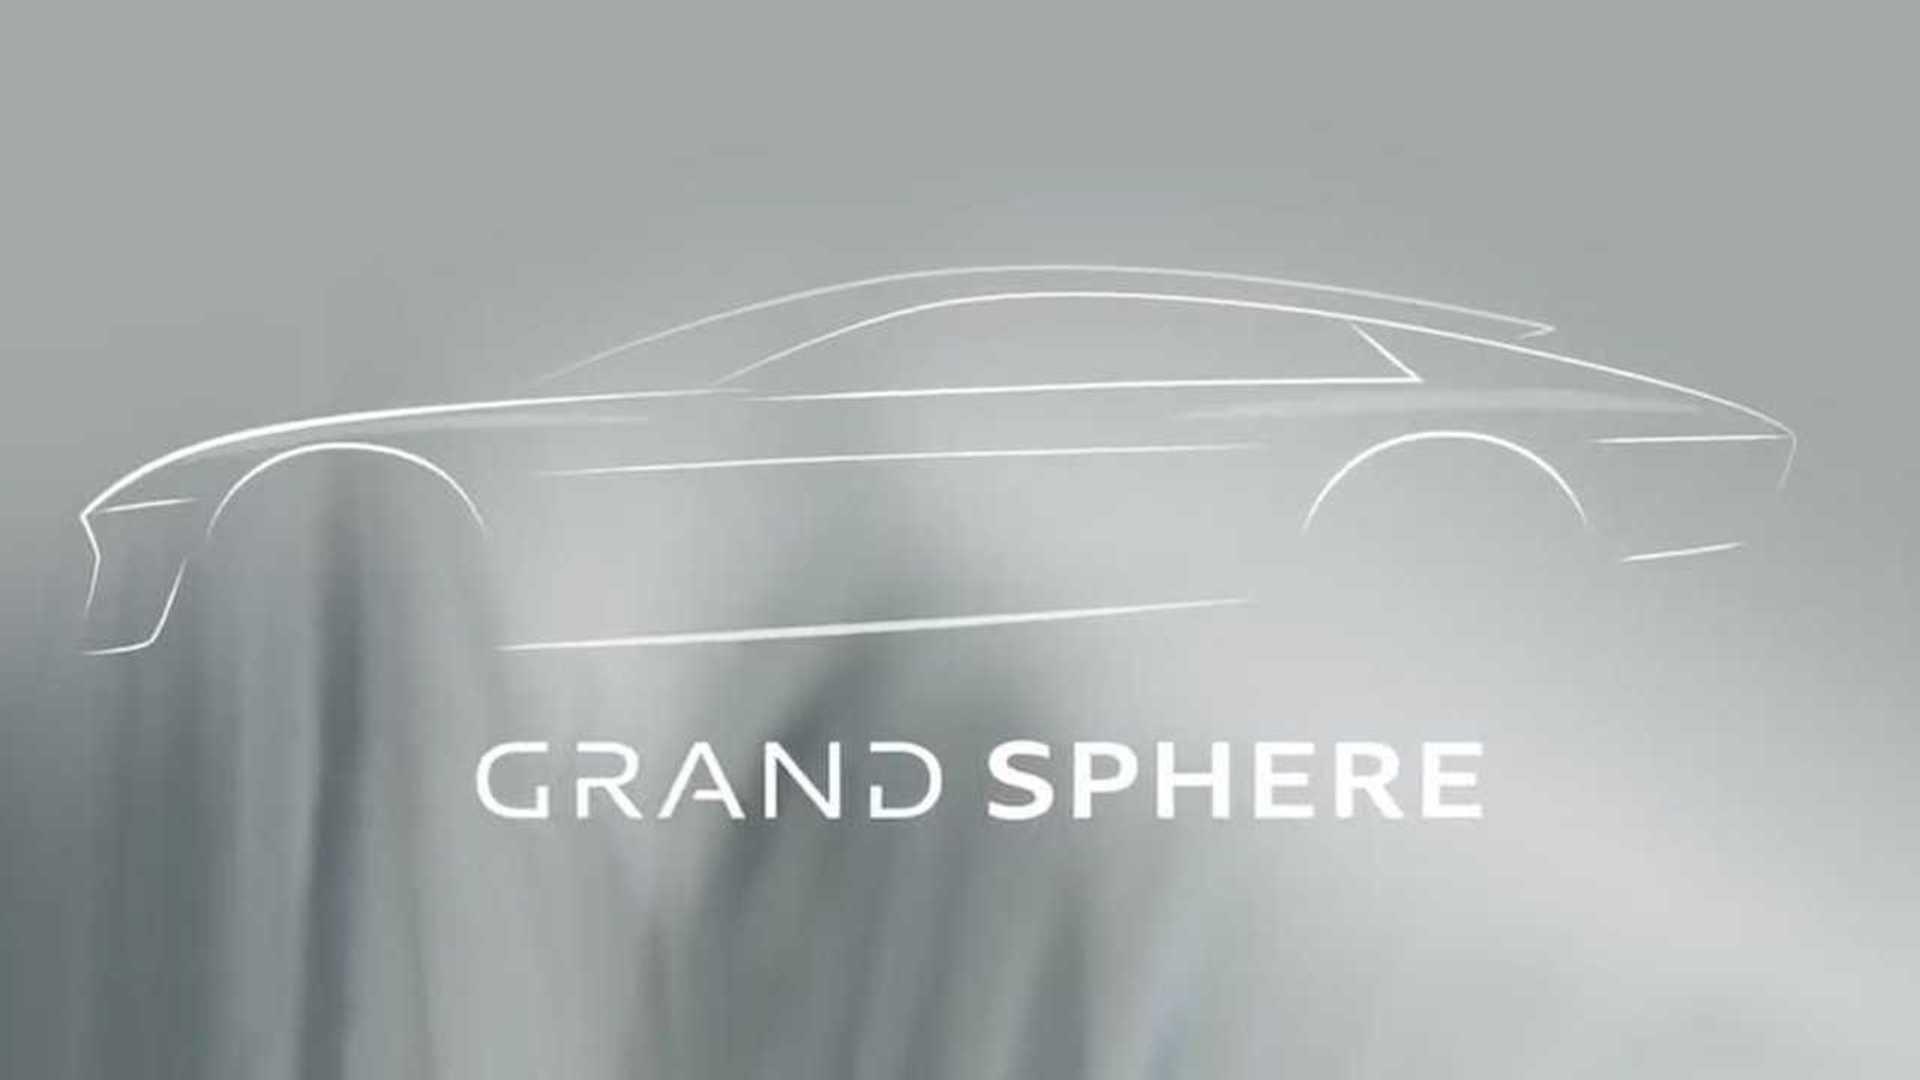 Audi Grand Sphere